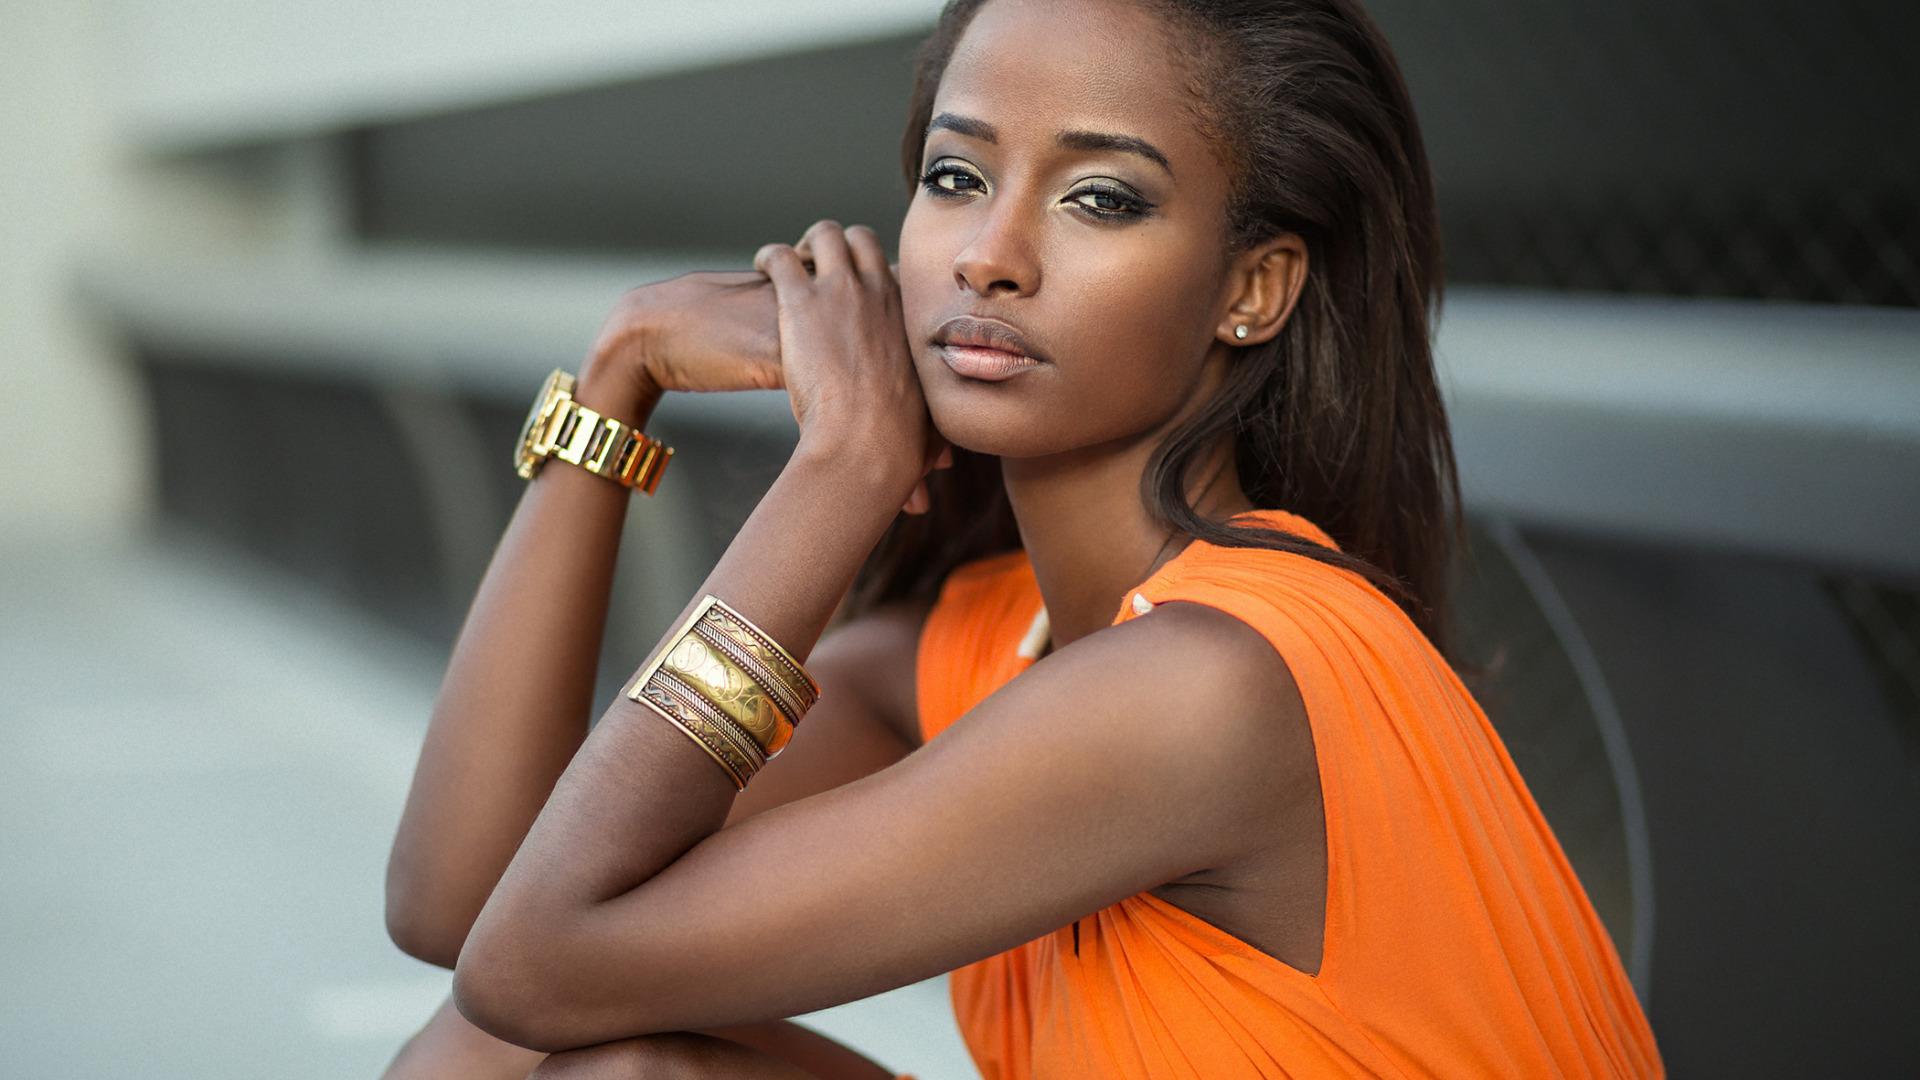 Free images of beautiful mulata girl, ebony sluts free gallery